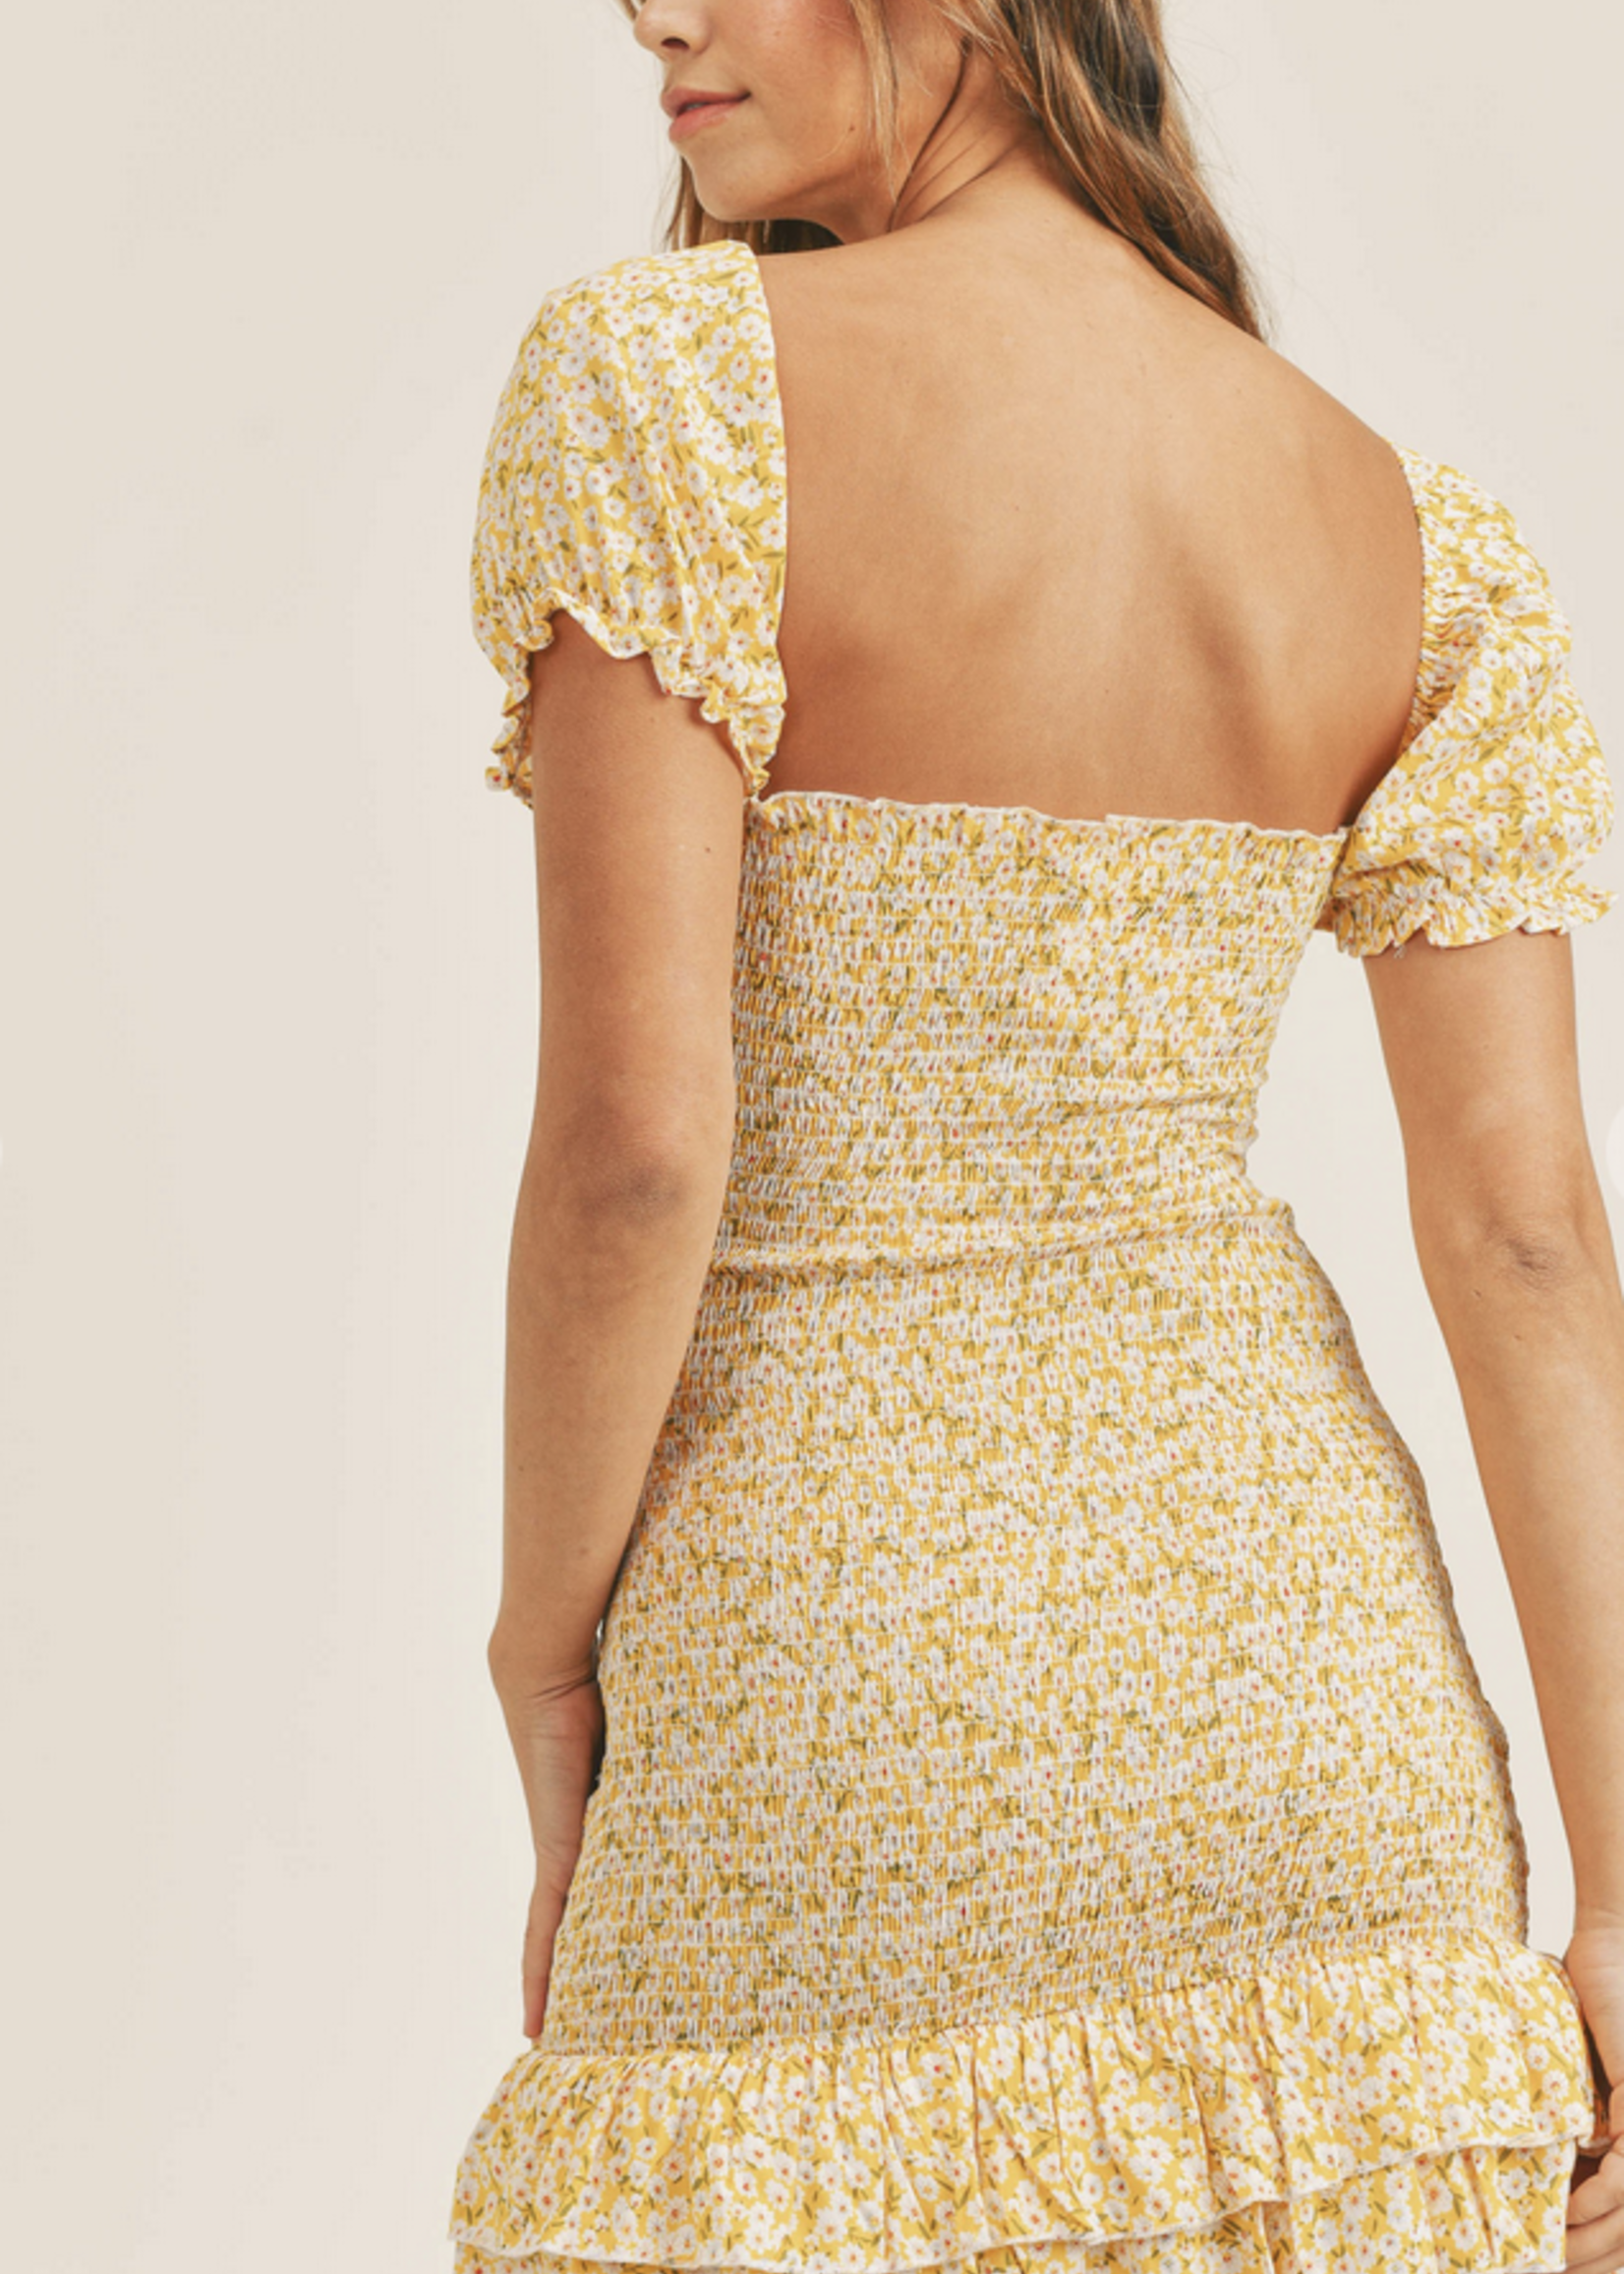 mable adriana dress